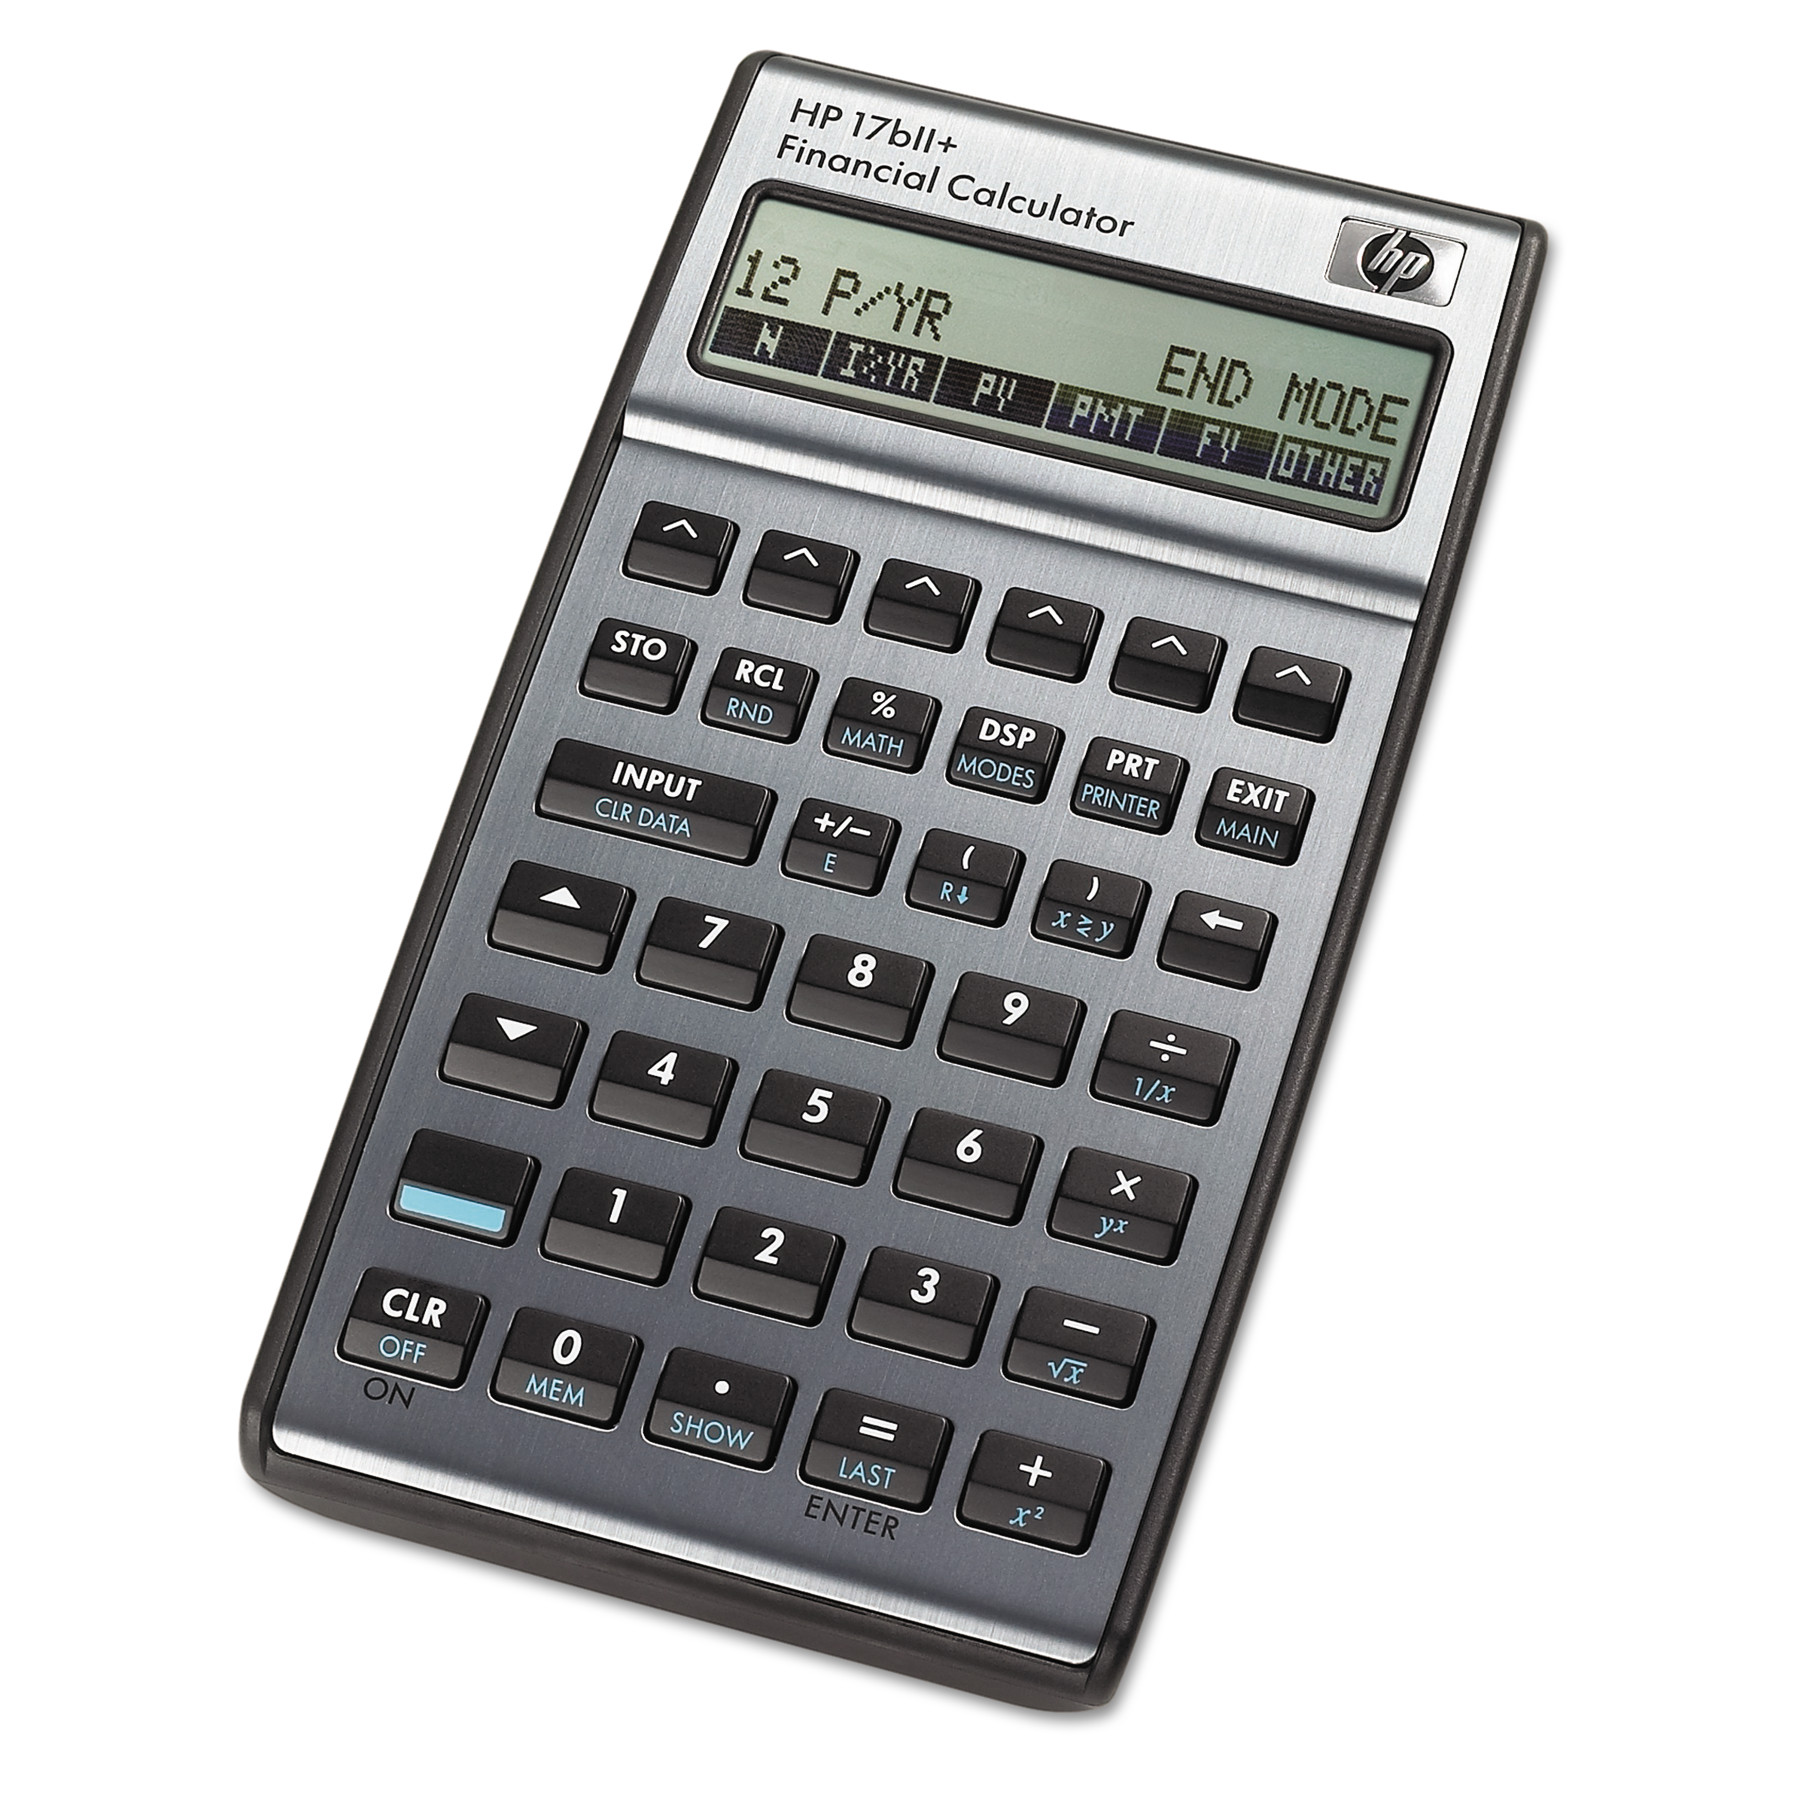 HP 17bII Financial Calculator 22Digit LCD Walmart – Financial Calculator